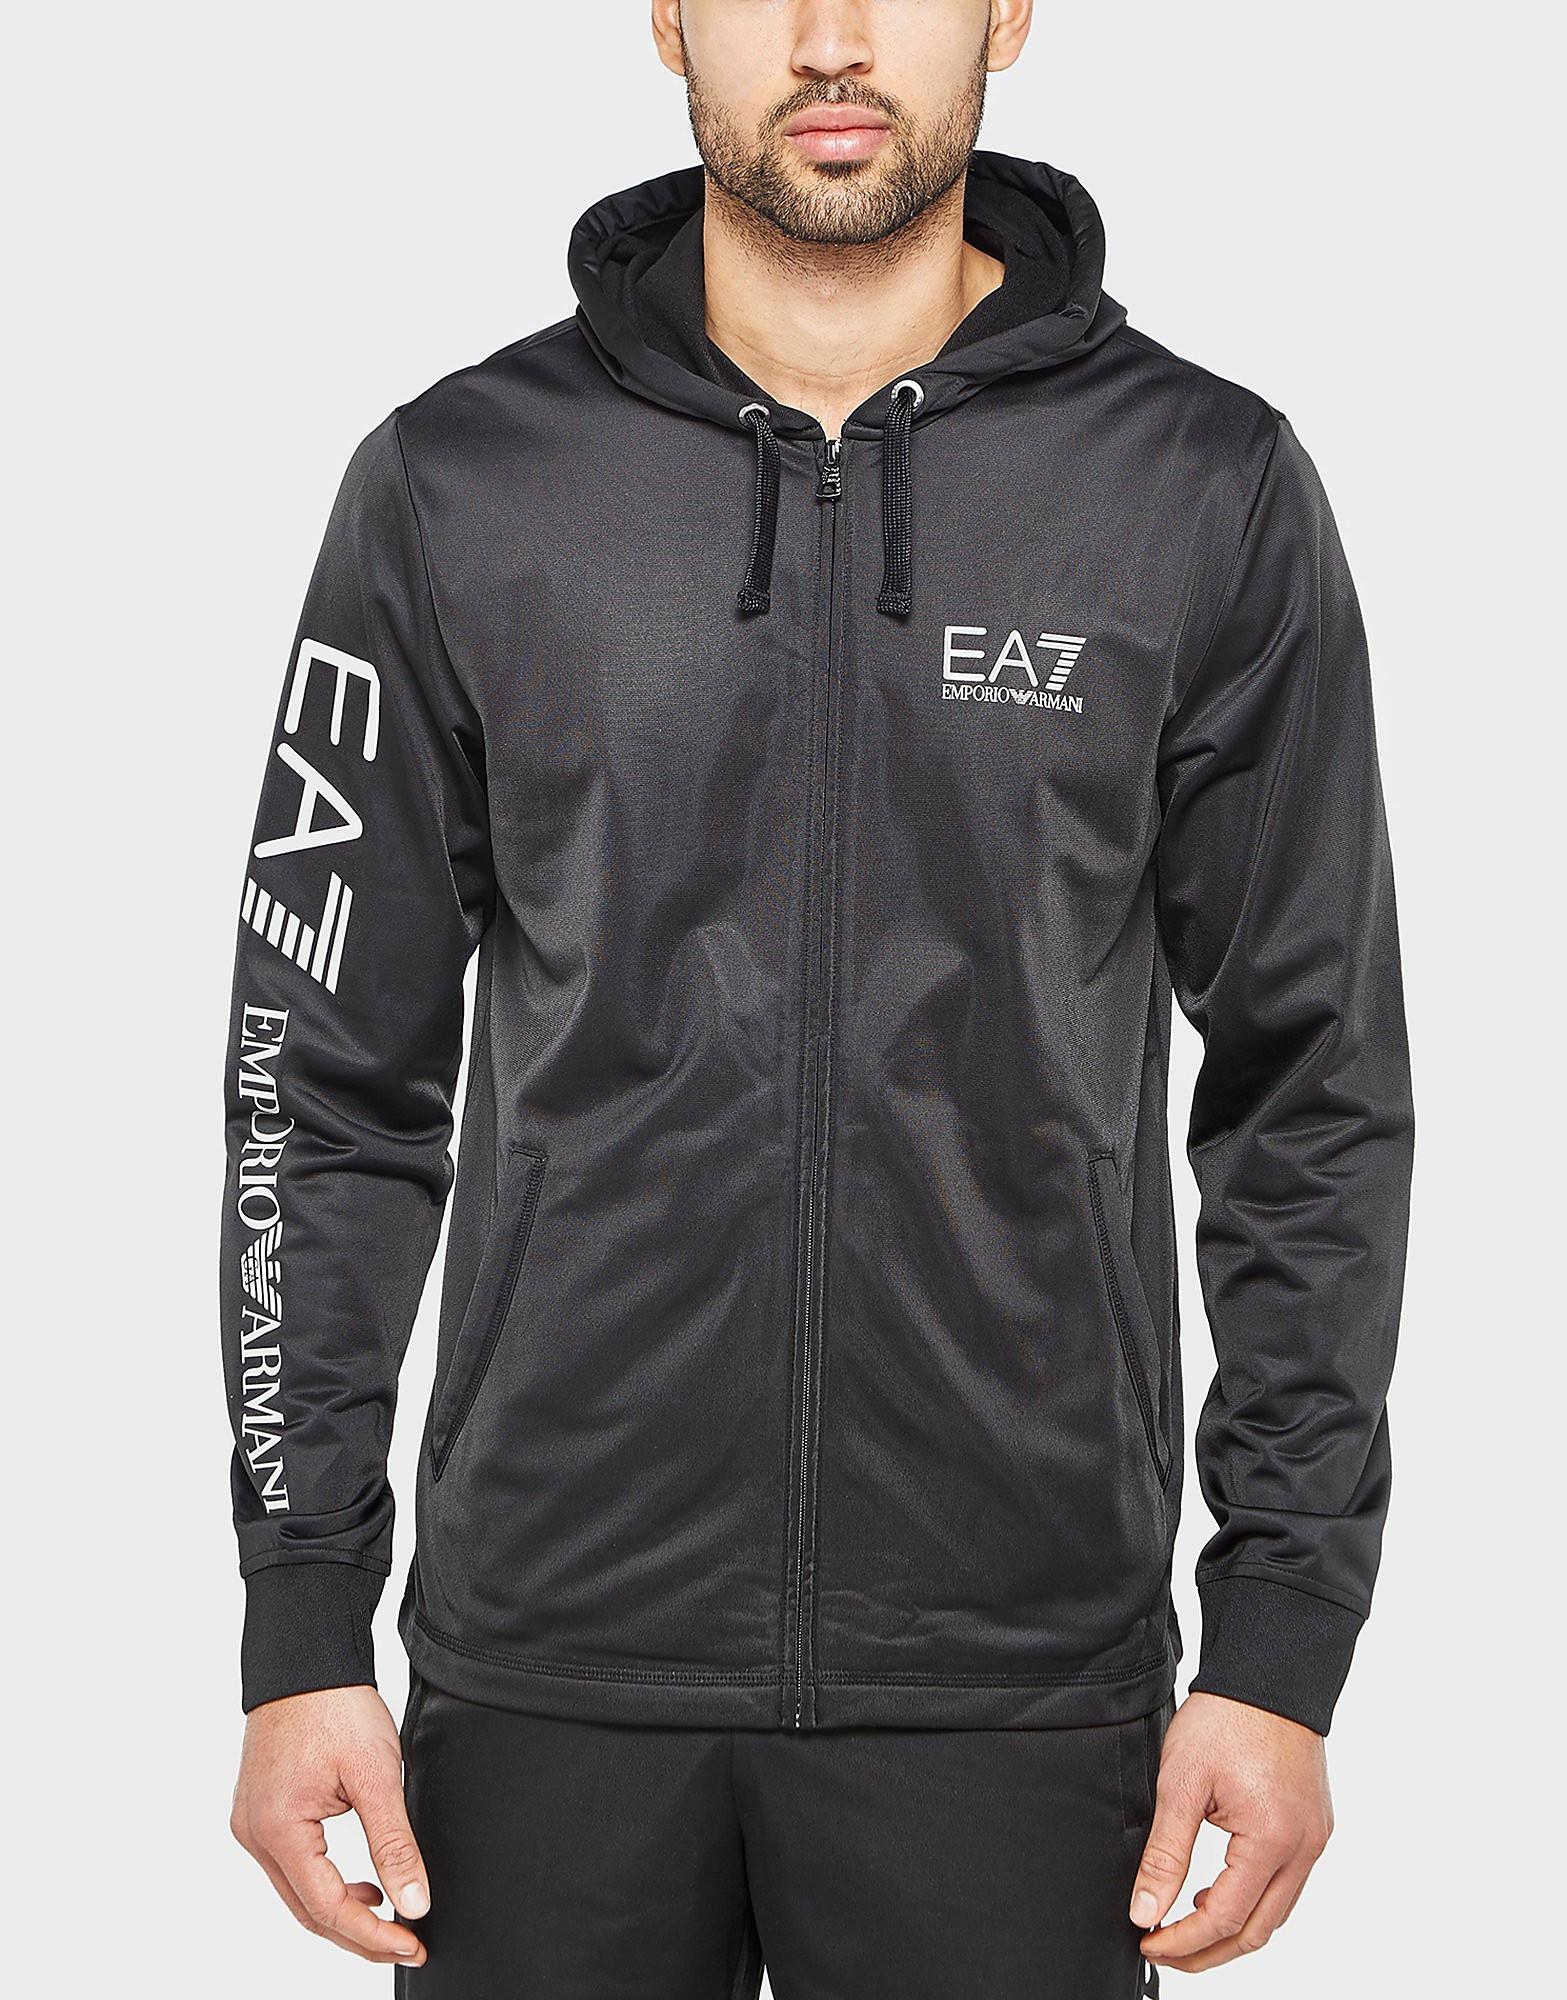 Emporio Armani EA7 Poly Full Zip Hoody